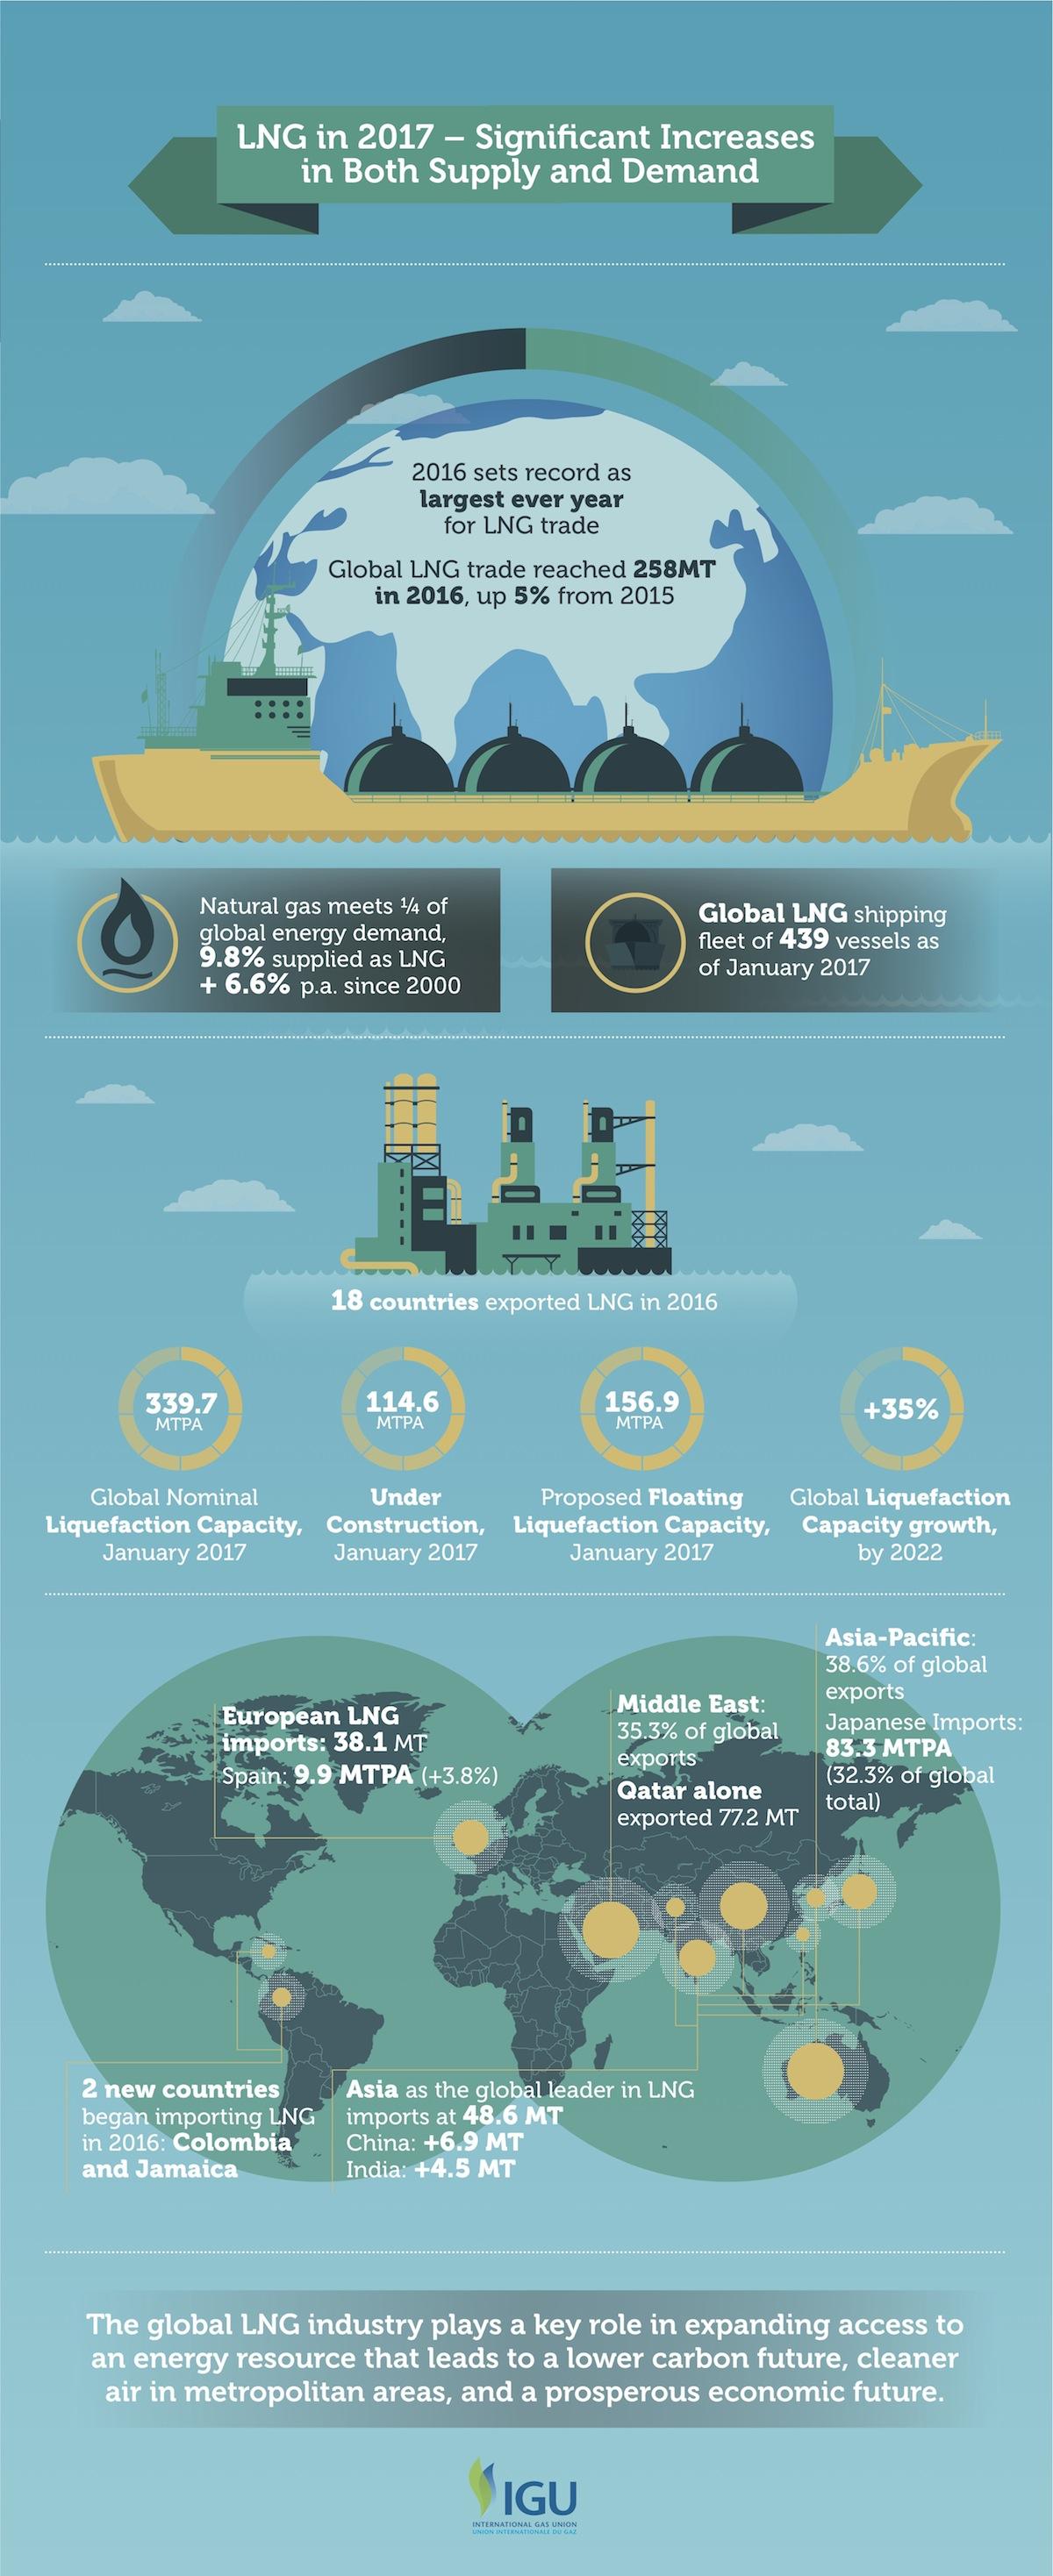 IGU Infographic